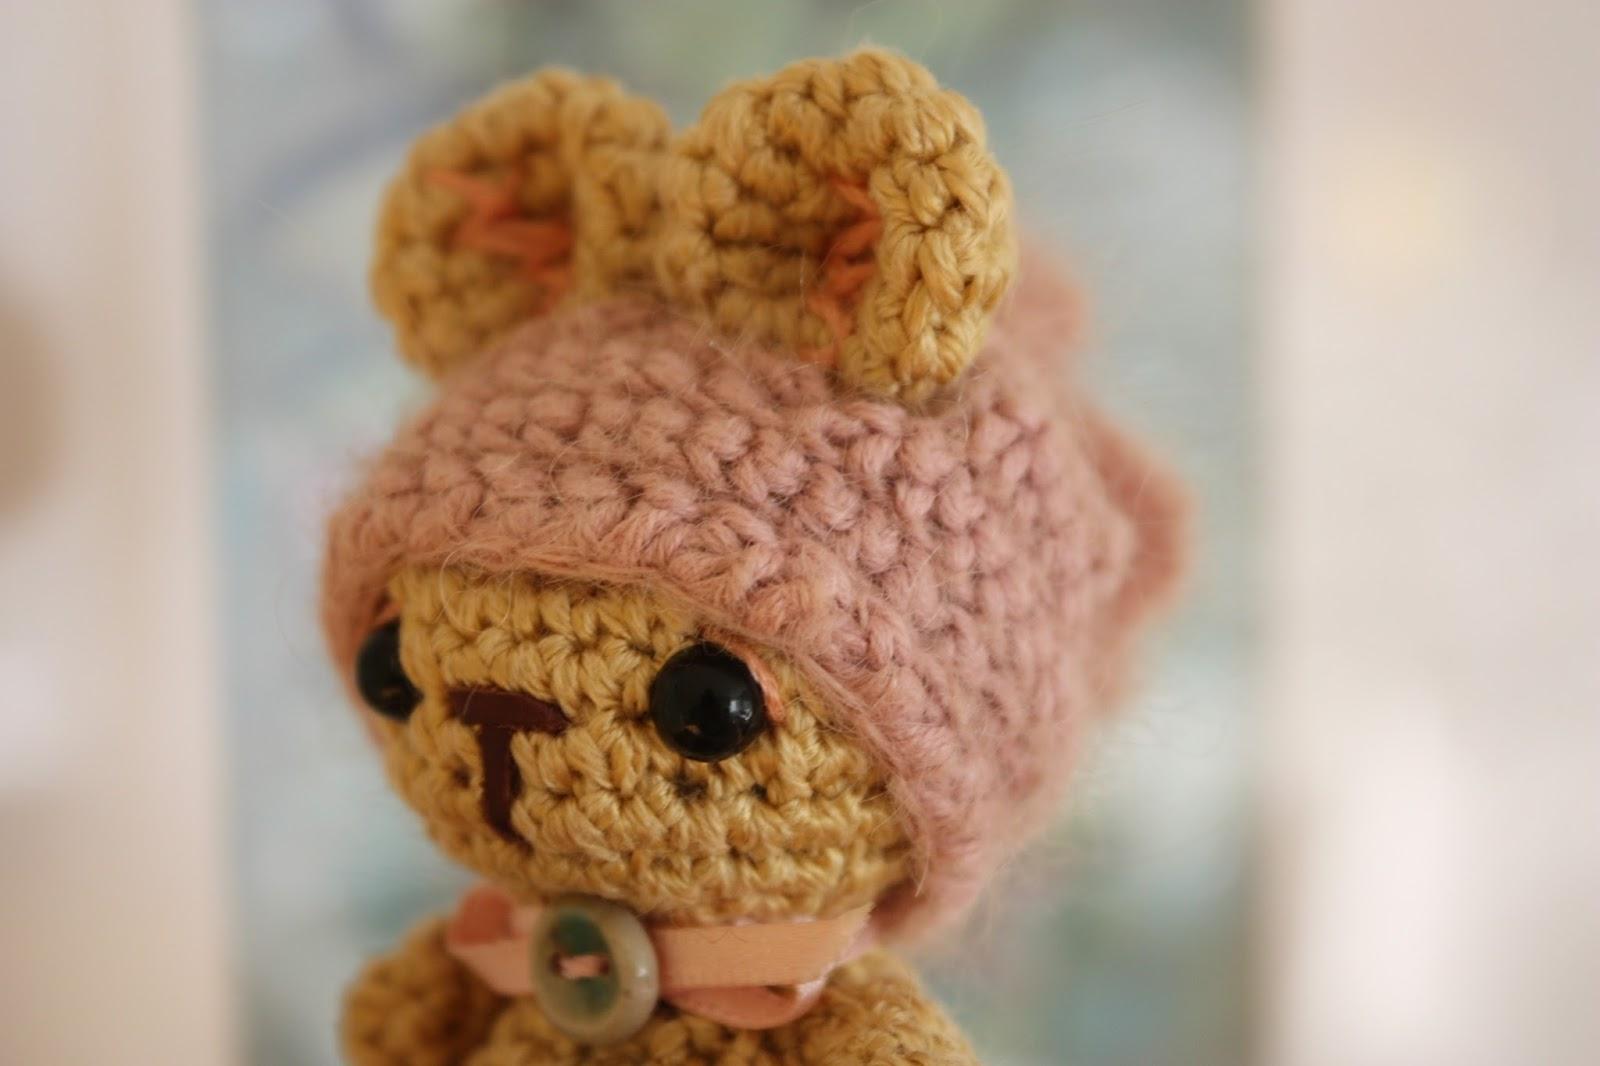 Amigurumi Blogspot : HAPPYAMIGURUMI: Freeform Crochet and Amigurumi Toys